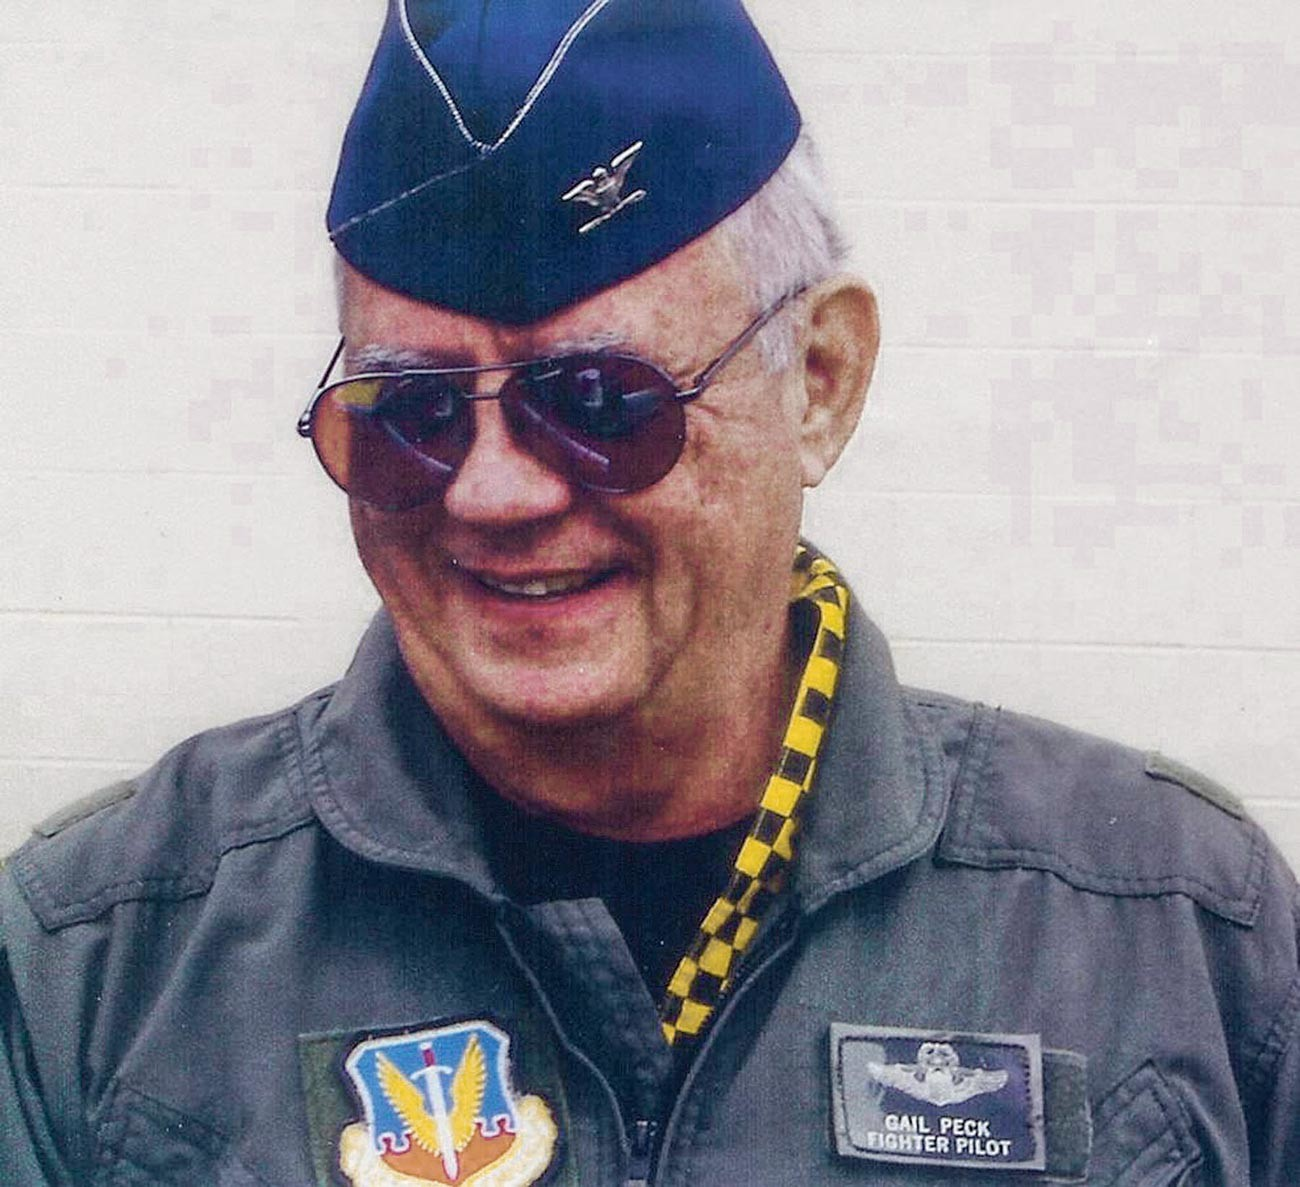 Le colonel Gail Peck